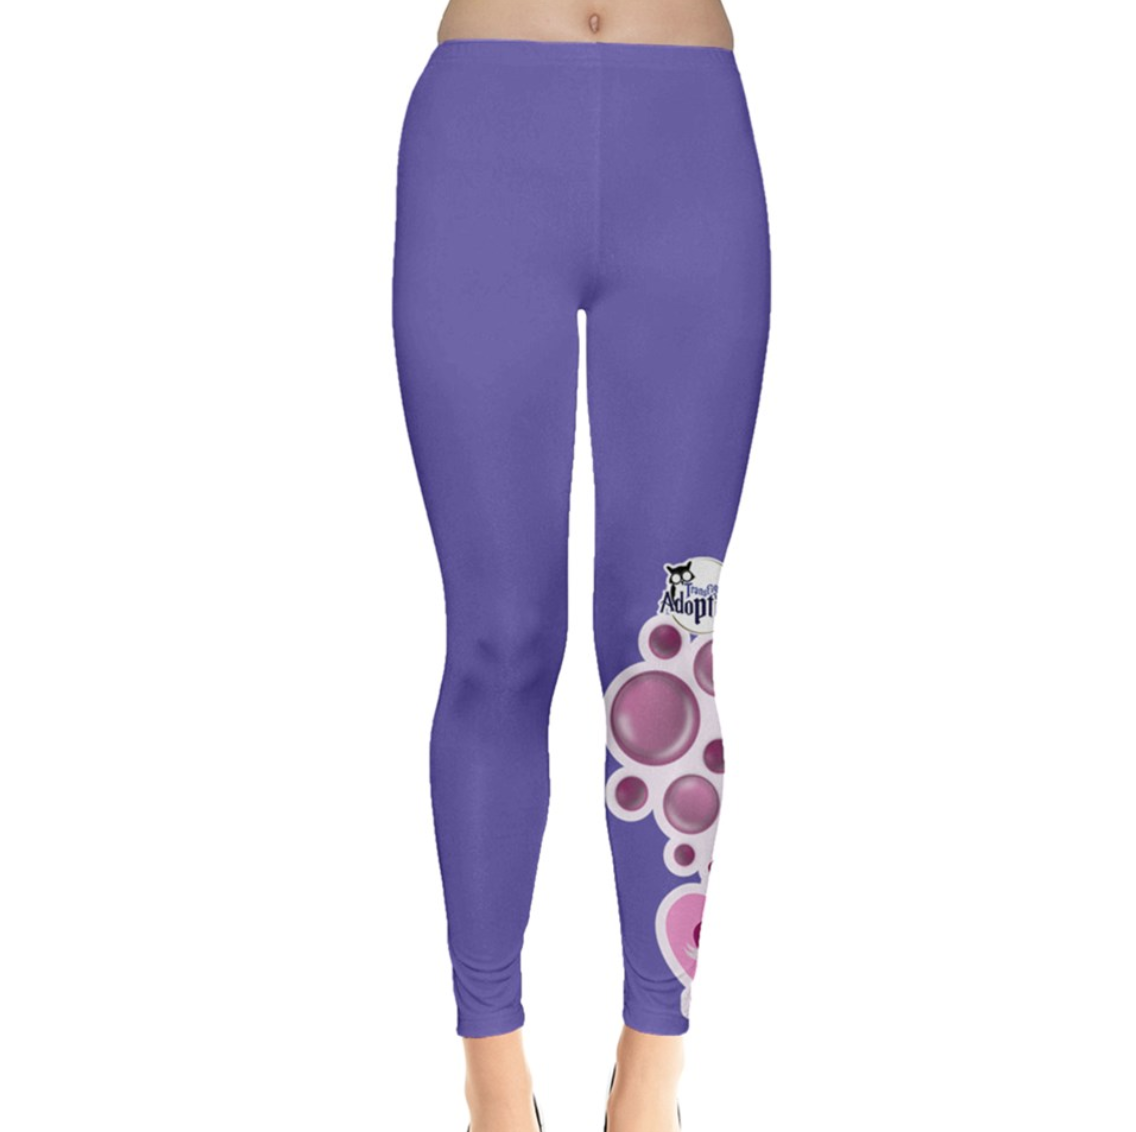 Charmed Leggings (Purple Solid w/Love Potion)